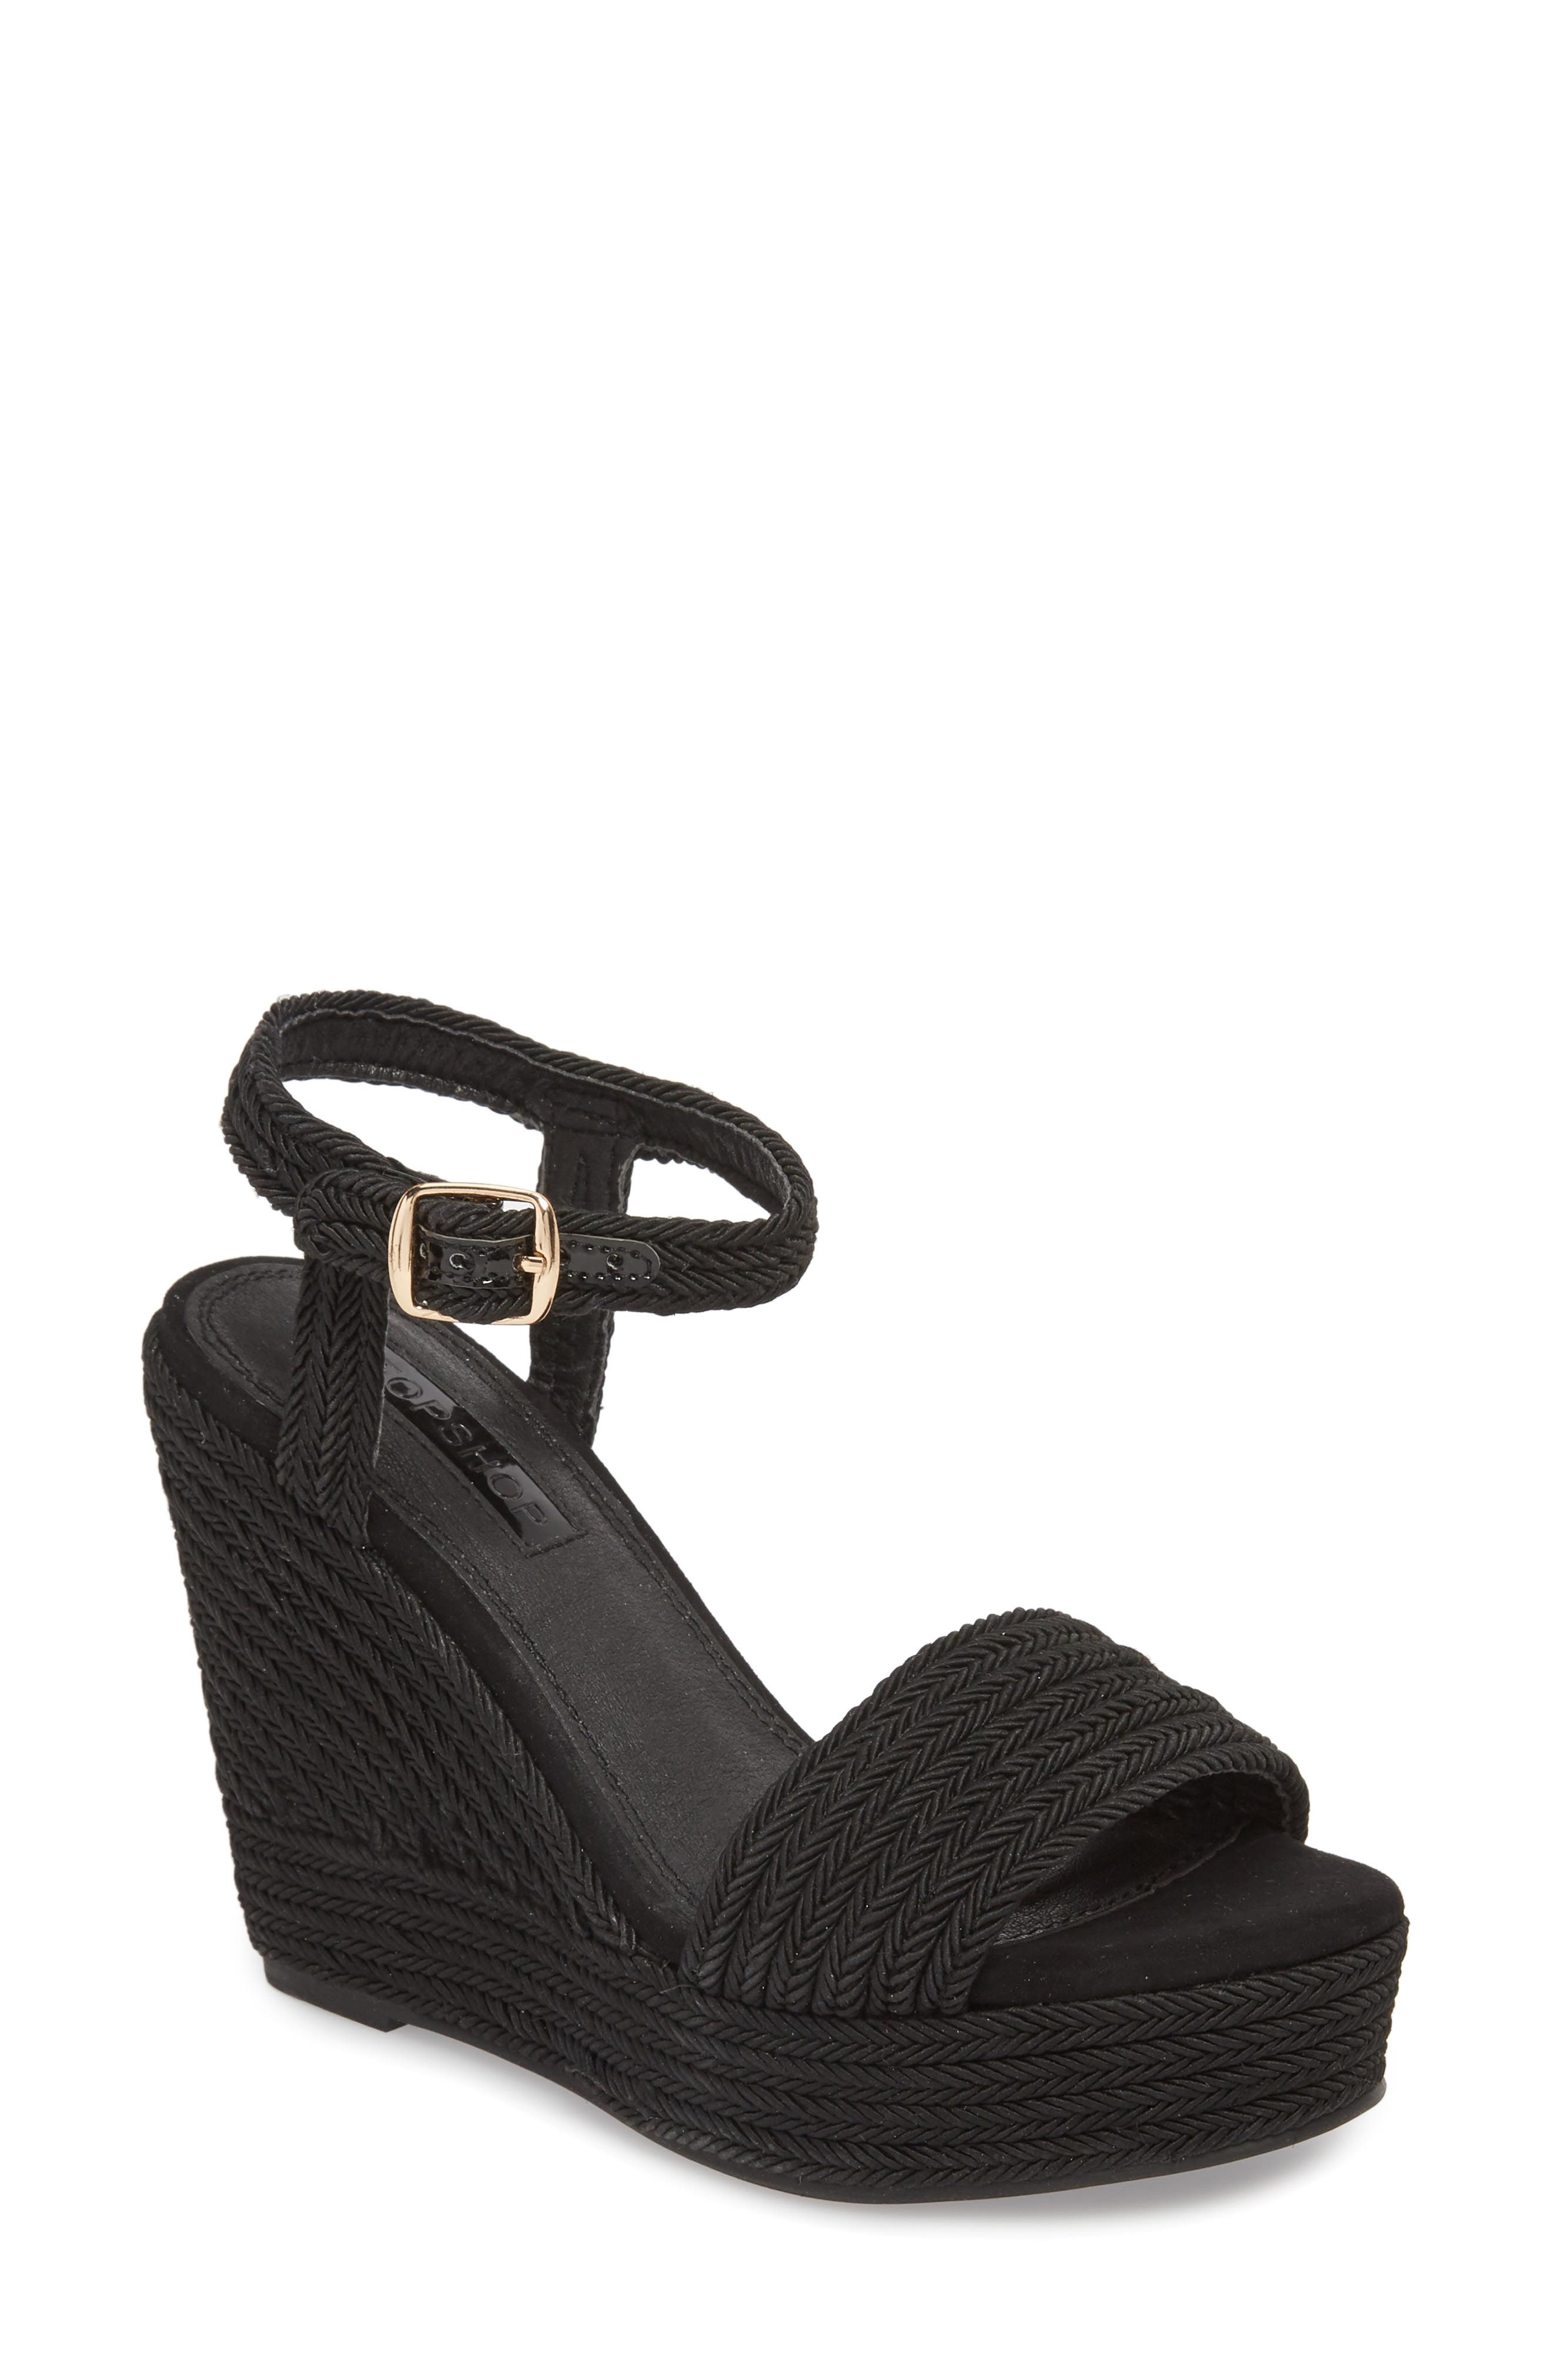 Wild Rope Platform Wedge Sandal,                         Main,                         color, BLACK MULTI